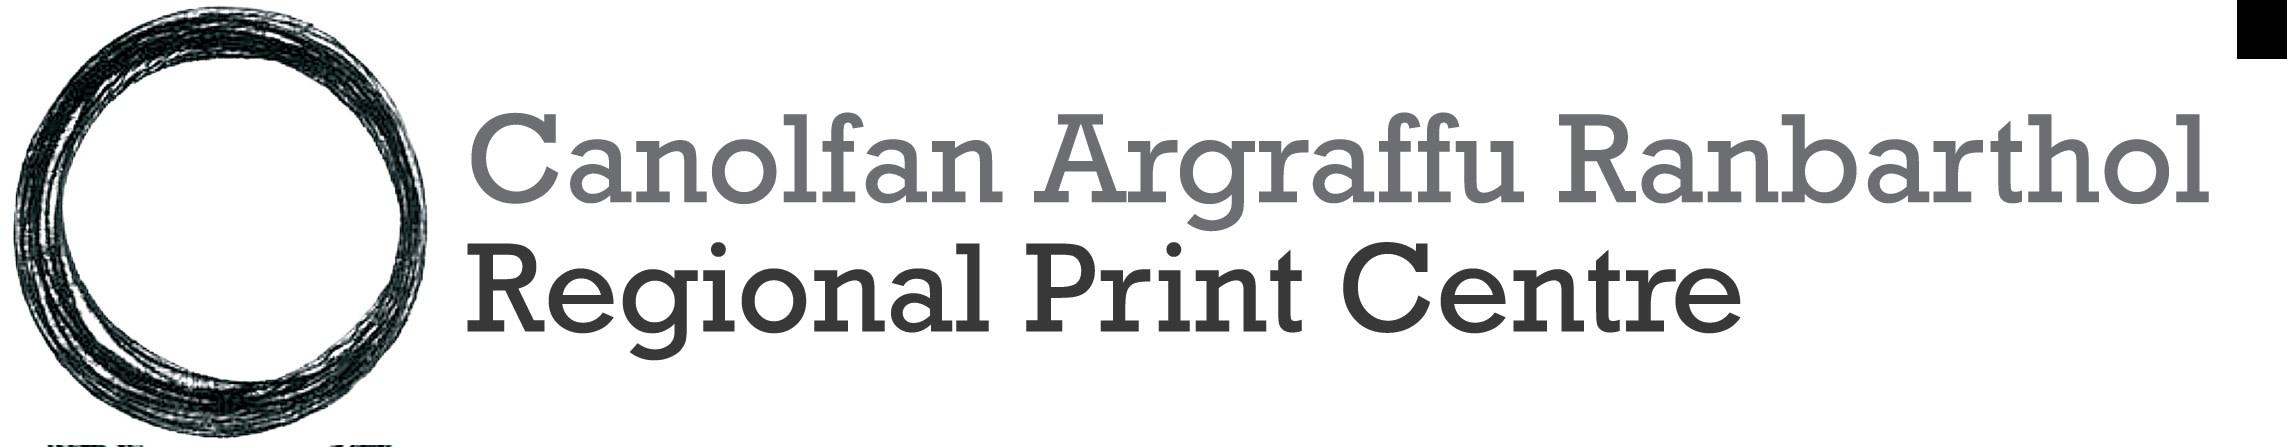 Regional Print Centre Award